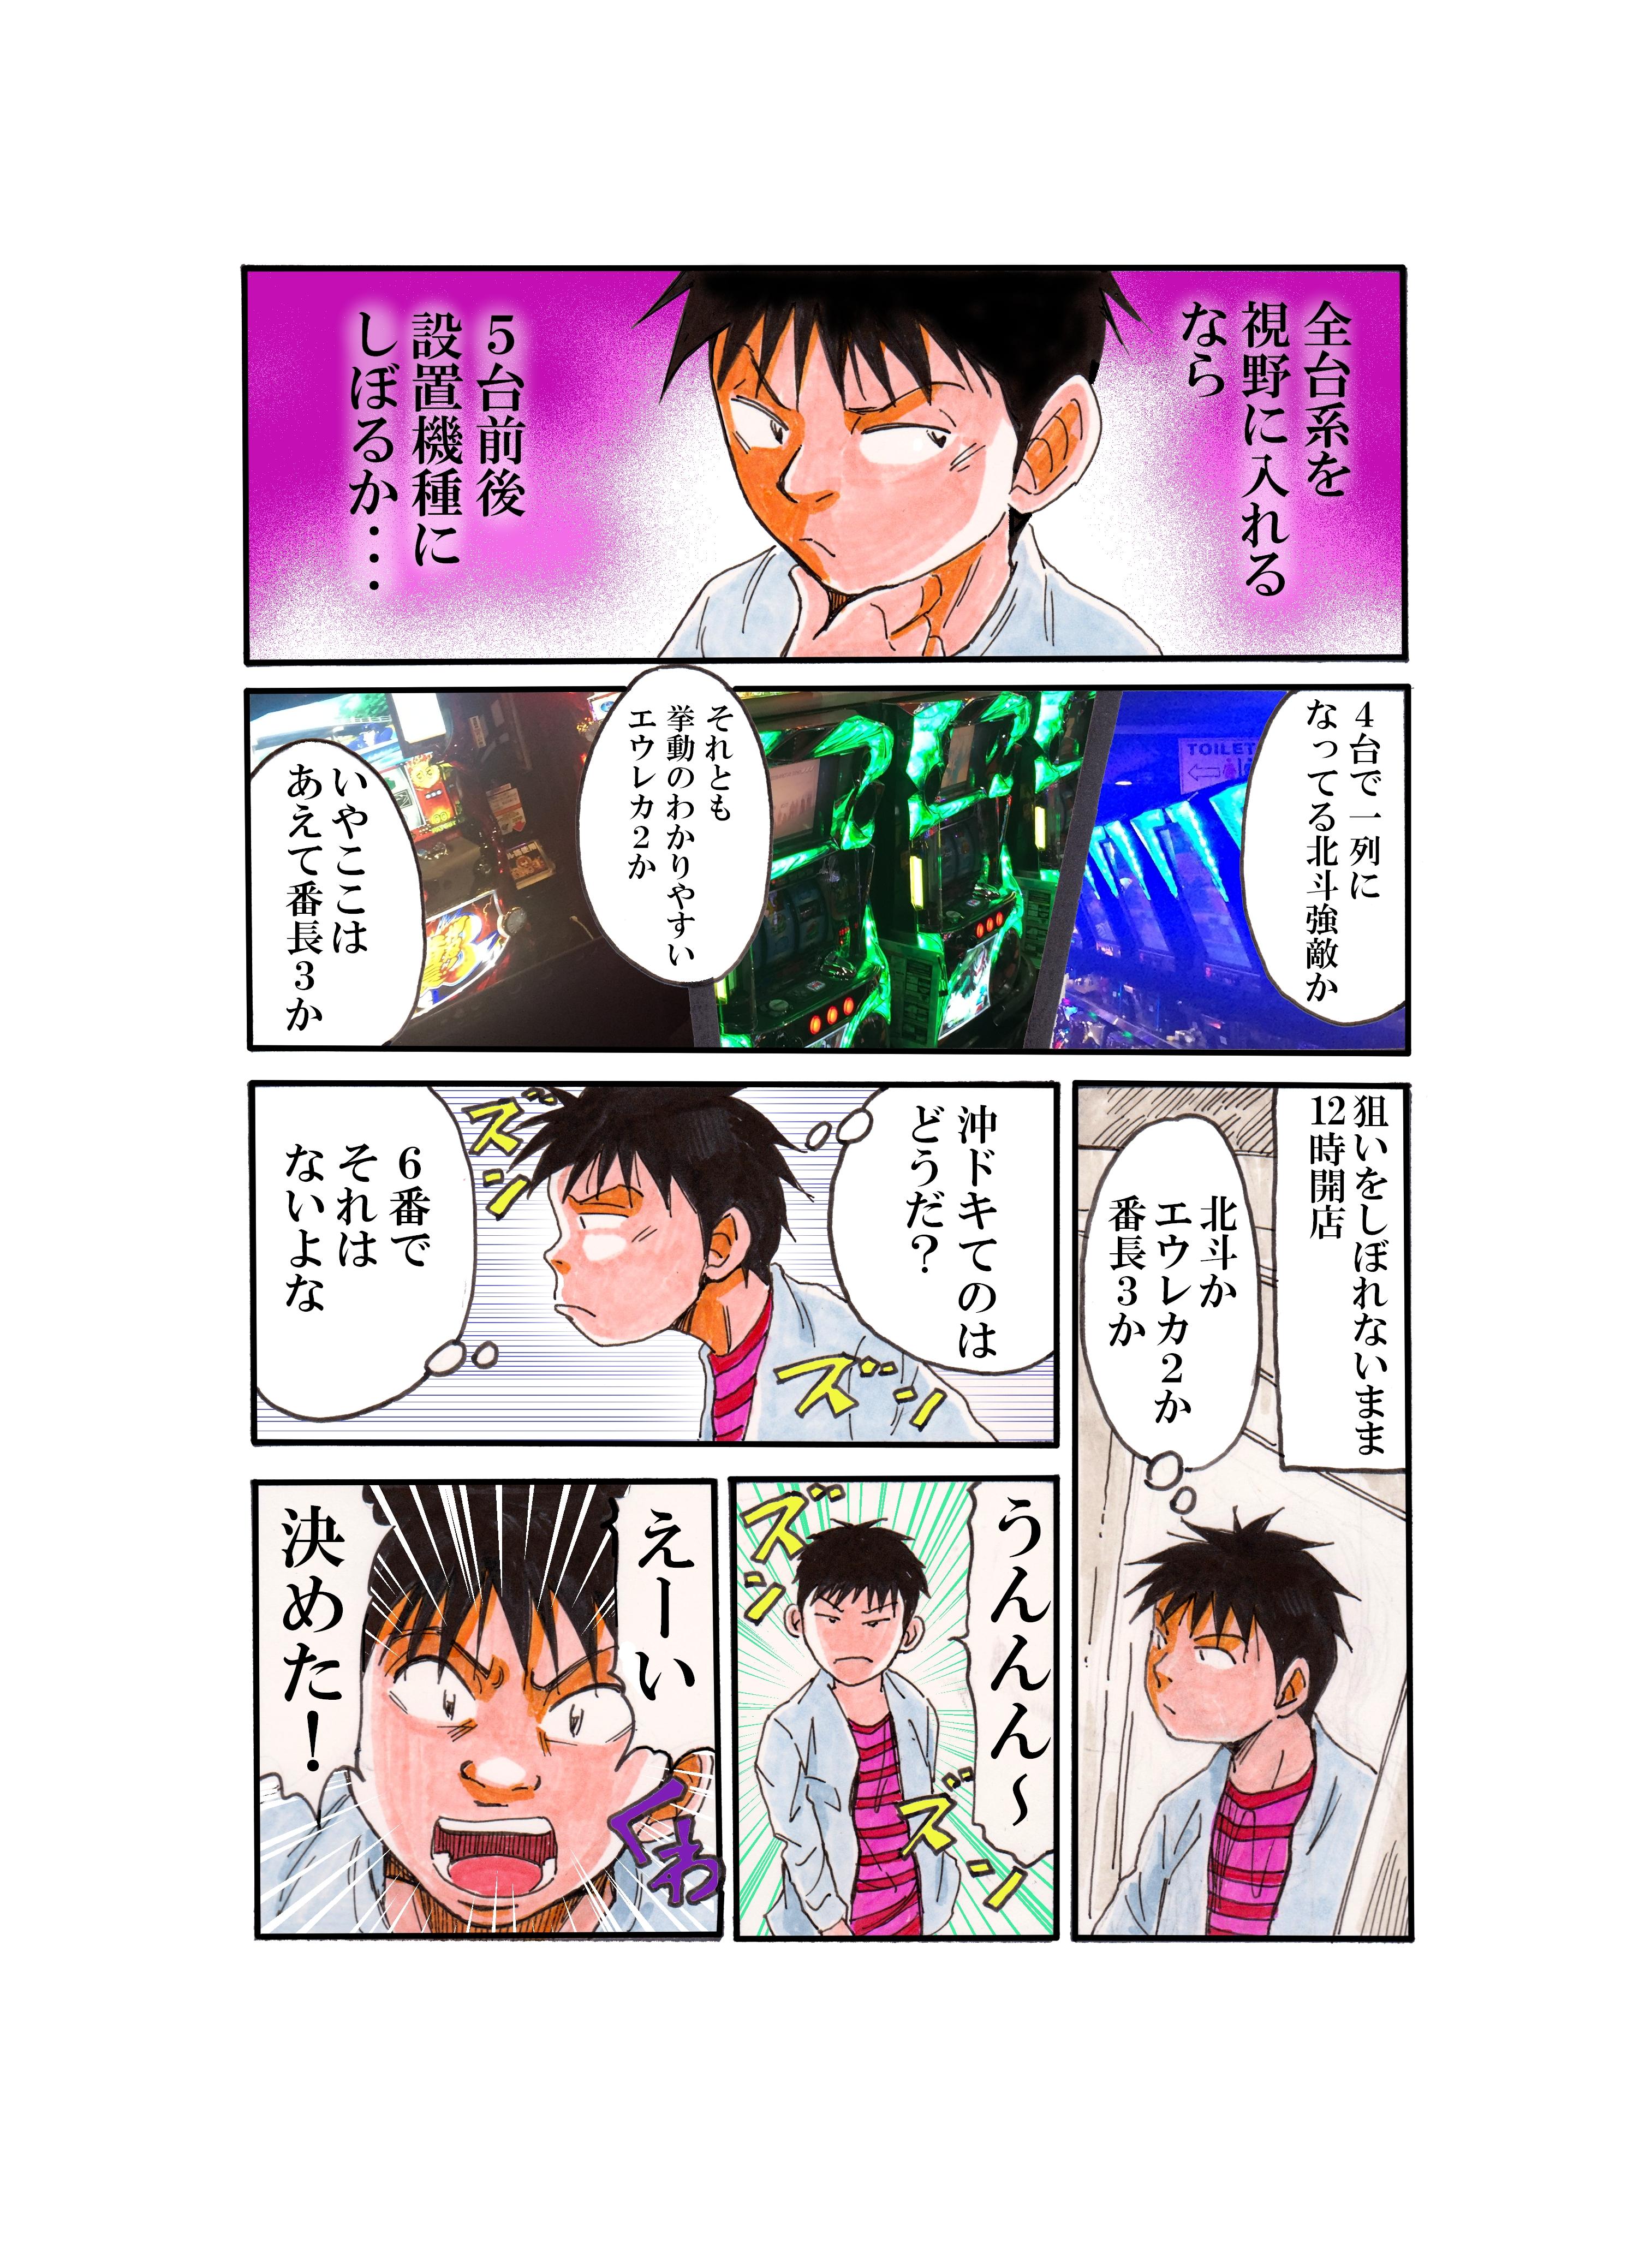 vol.3-3キング大解析